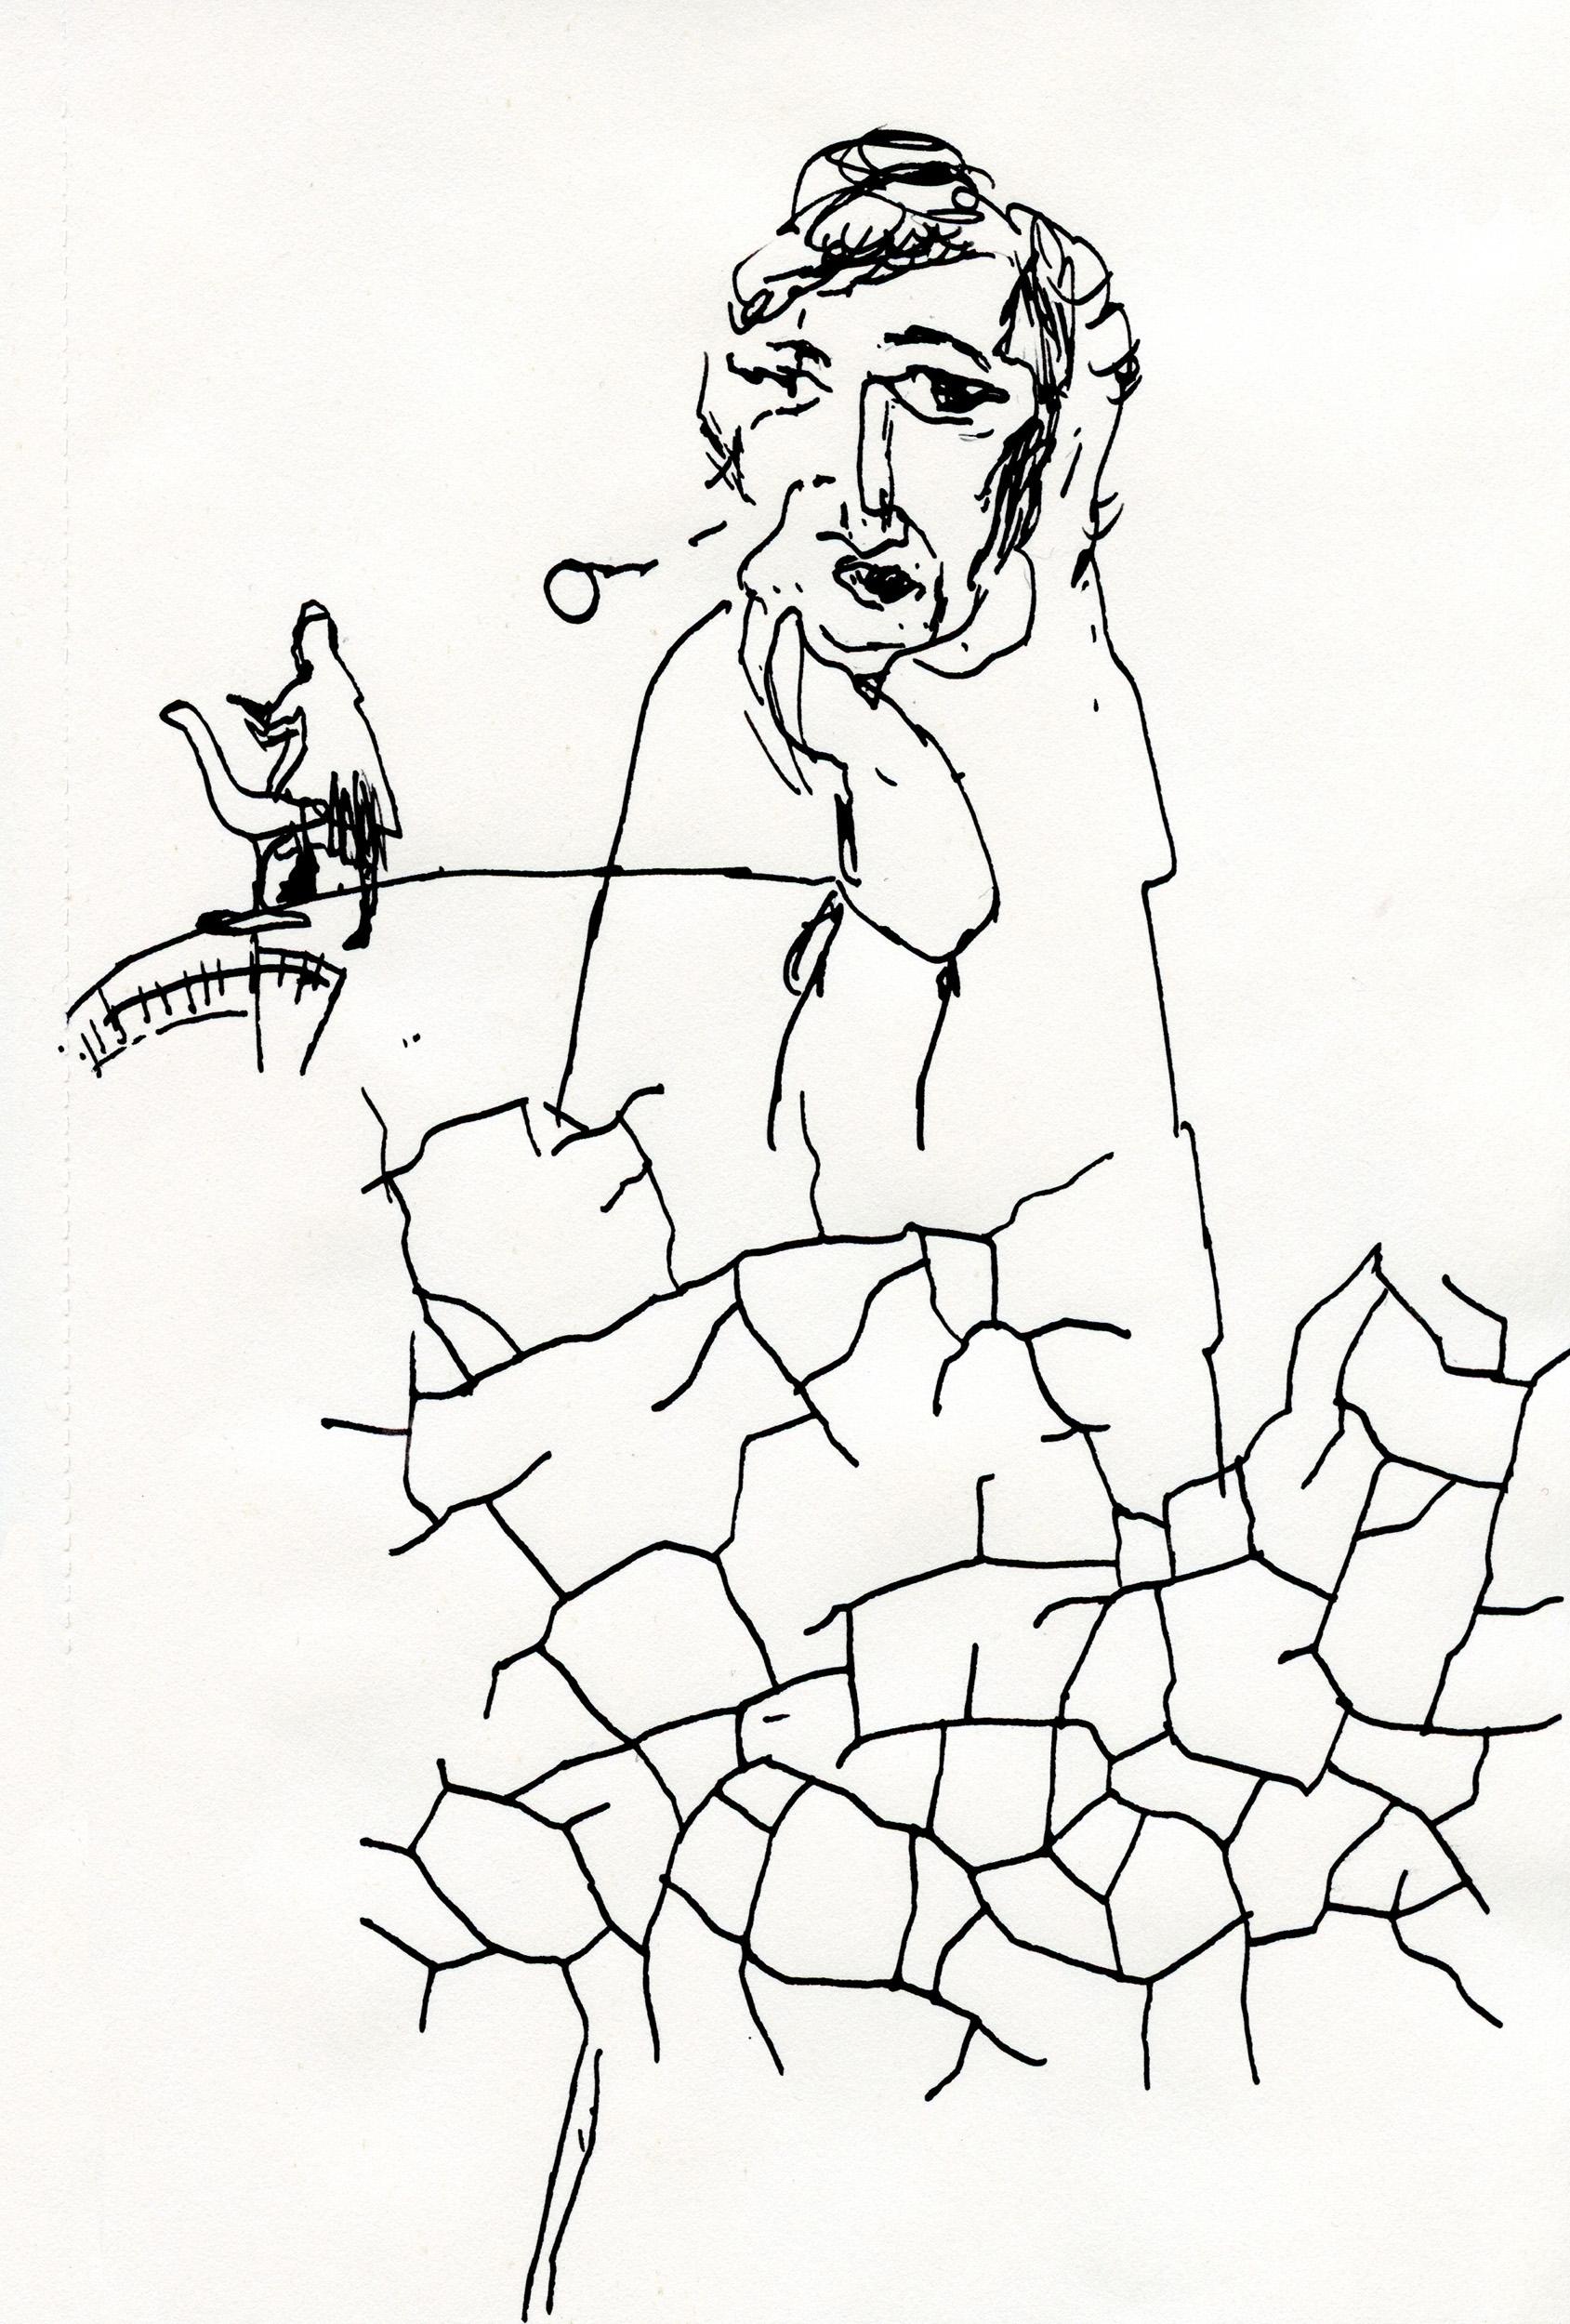 drawing020.jpg